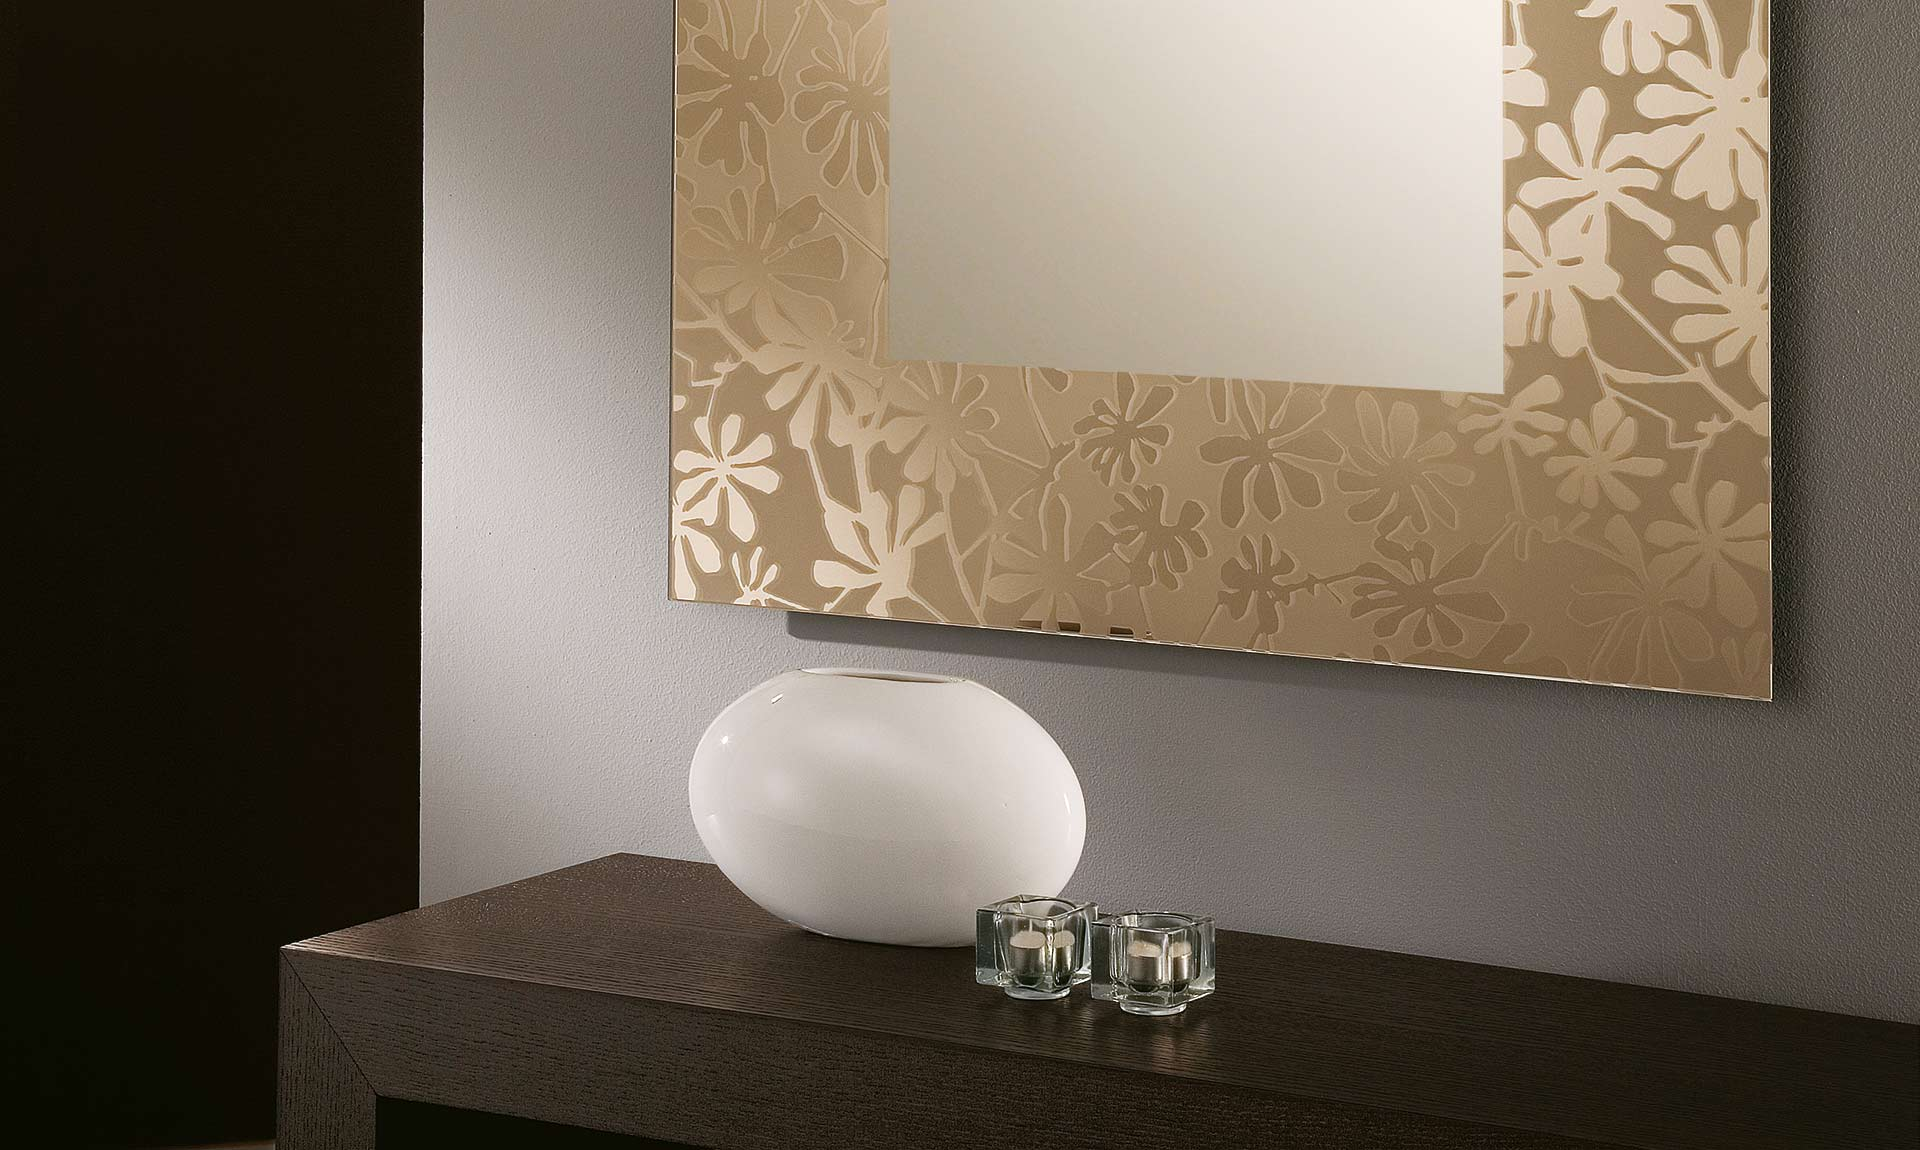 Specchio bronzo diva meroni arreda